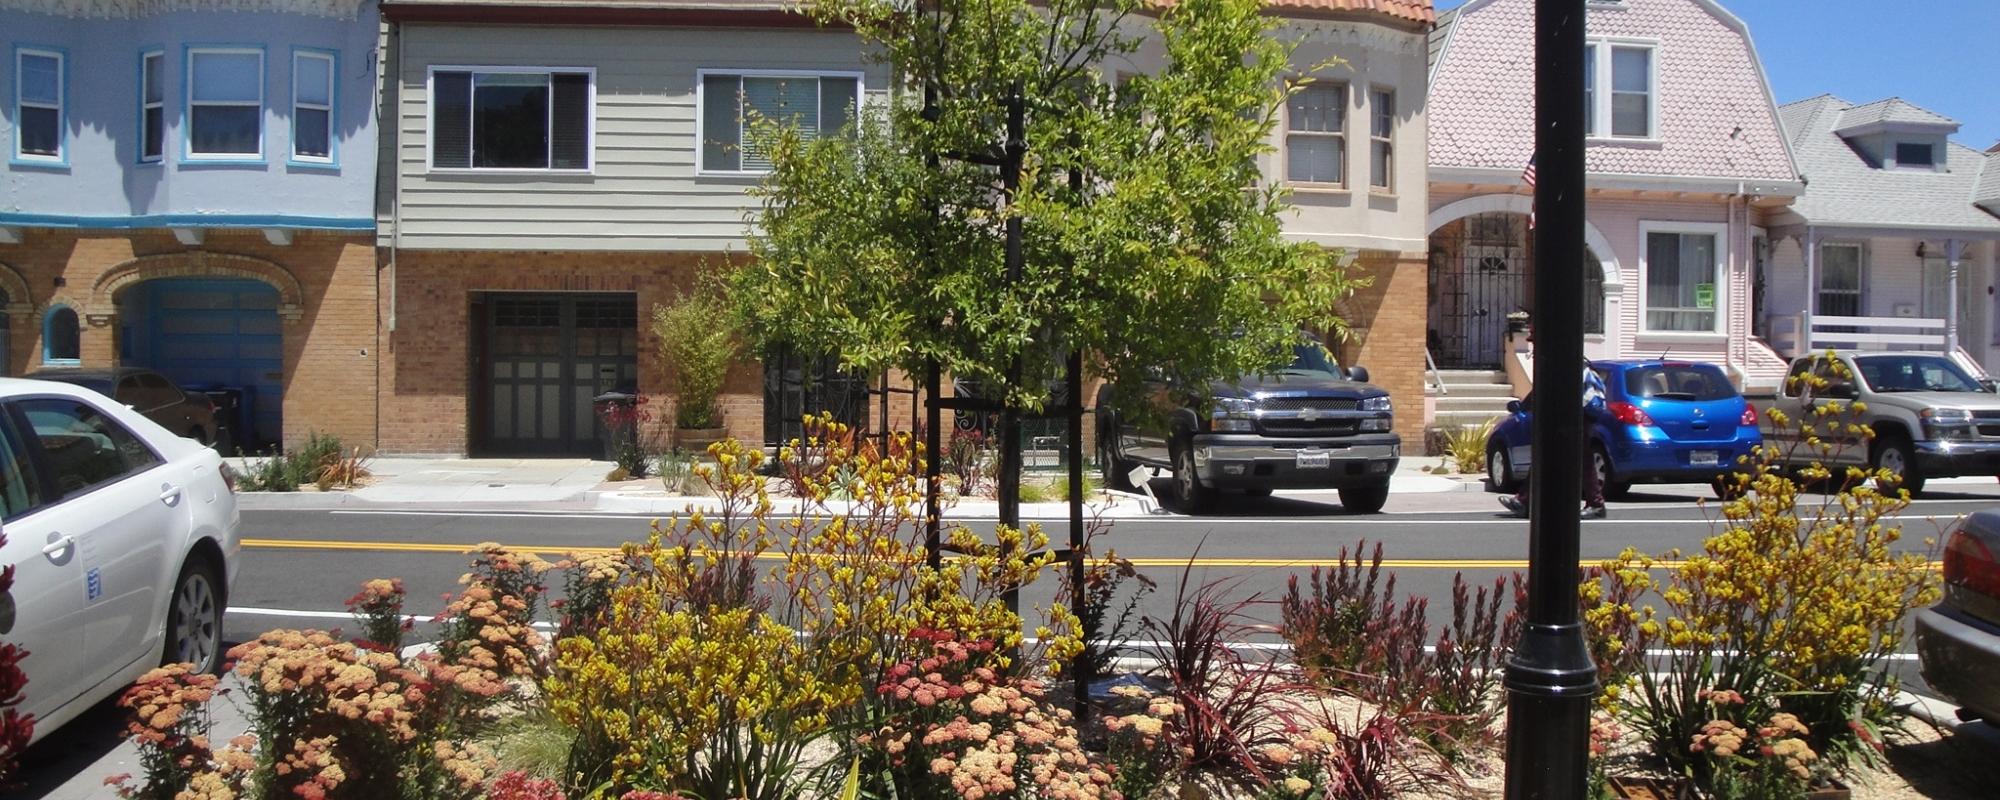 Newcomb Streetscape Improvement Project